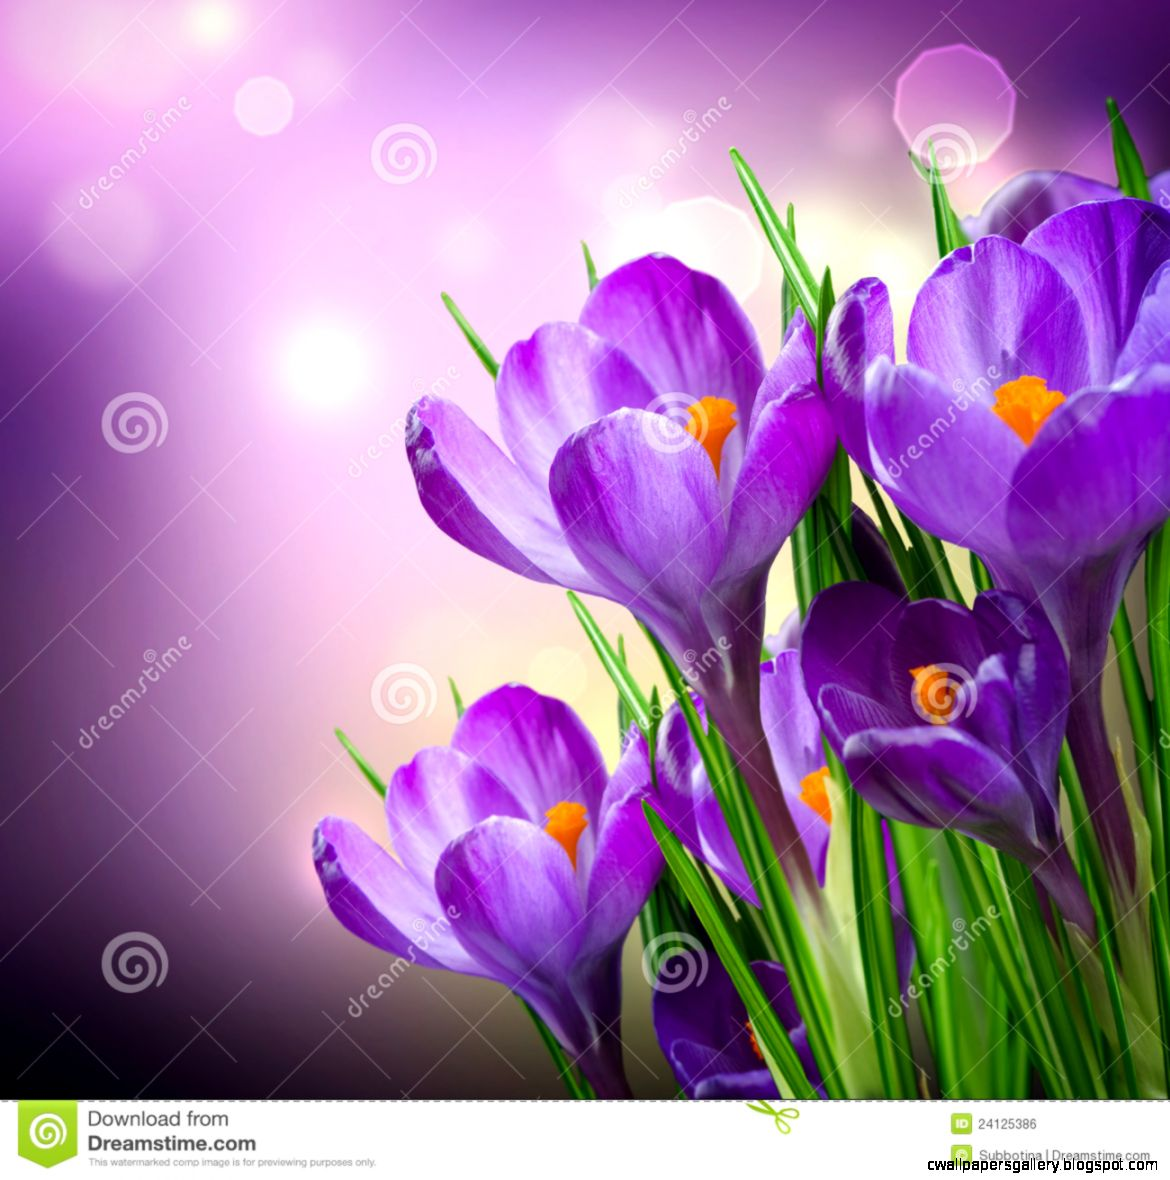 Crocus Spring Flowers Royalty Free Stock Image   Image 24125386